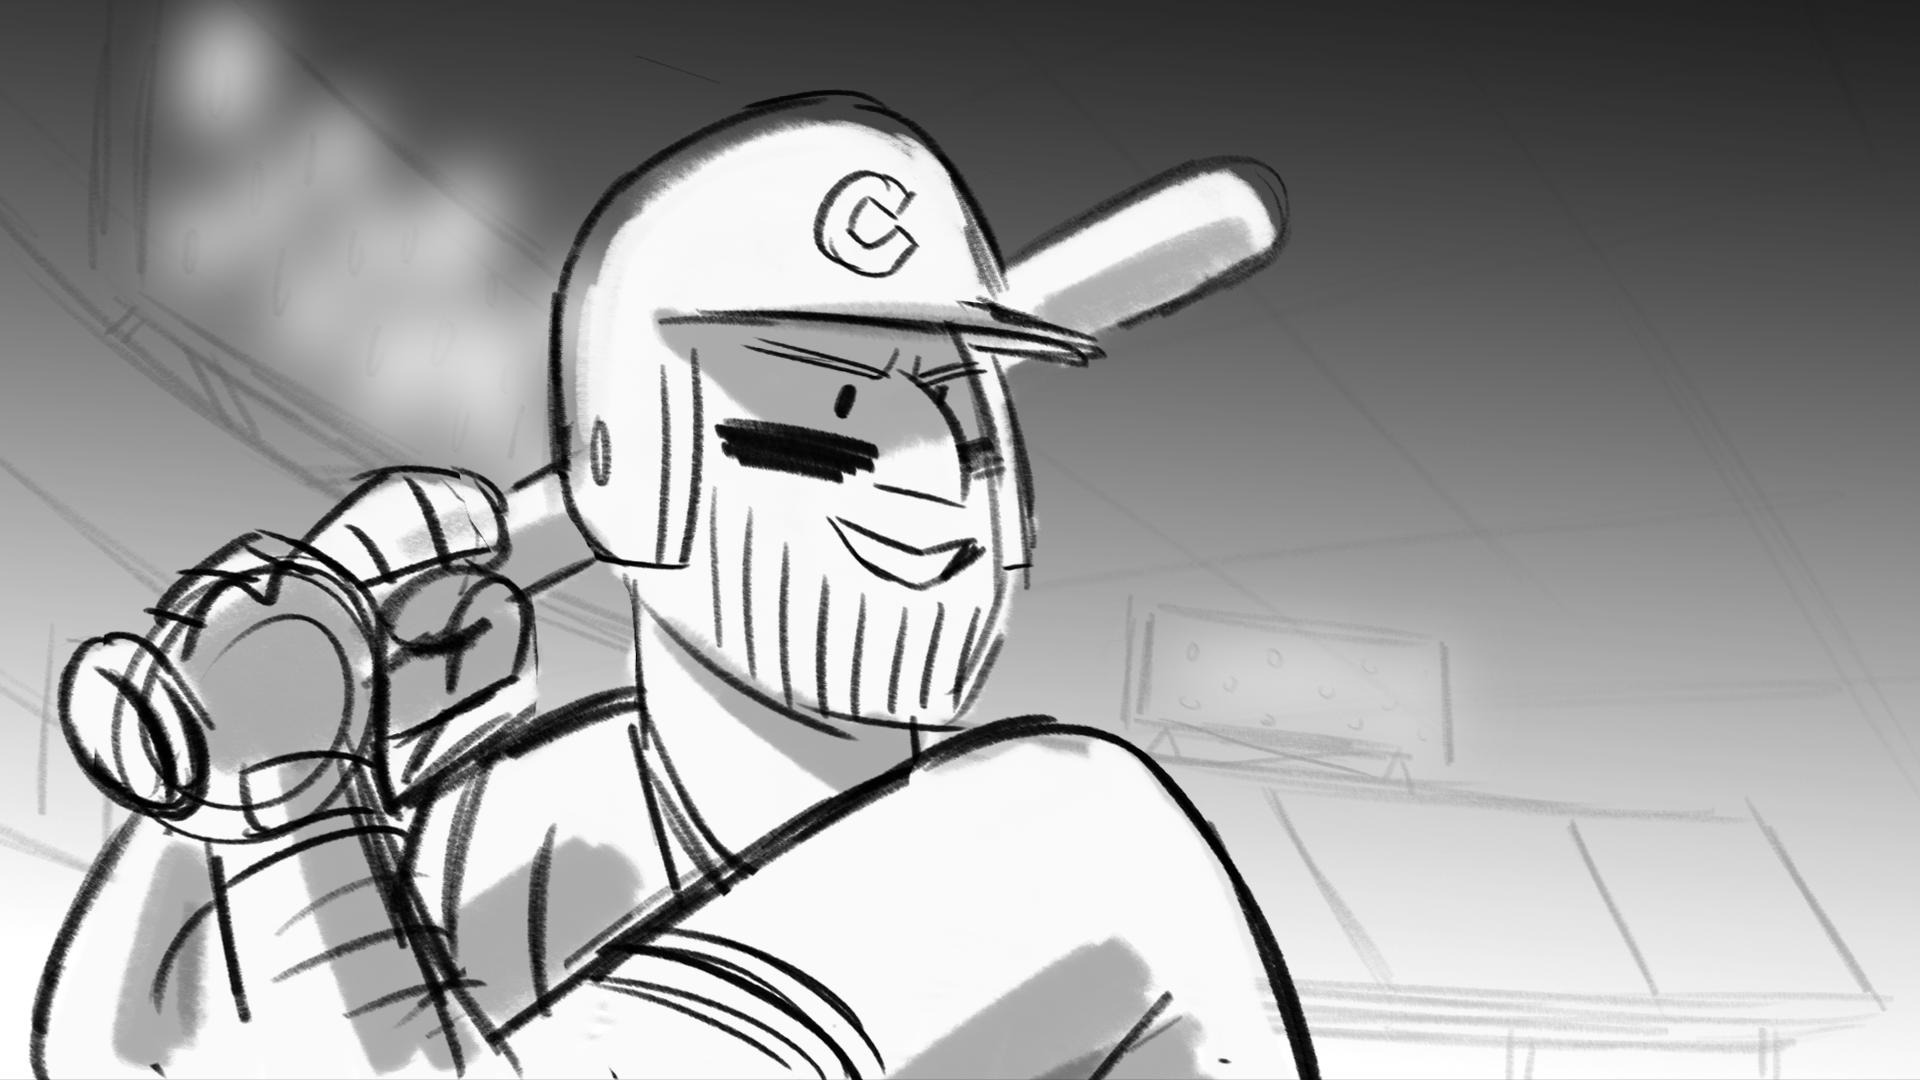 baseballBoards_A__0020_Layer-Comp-21.png